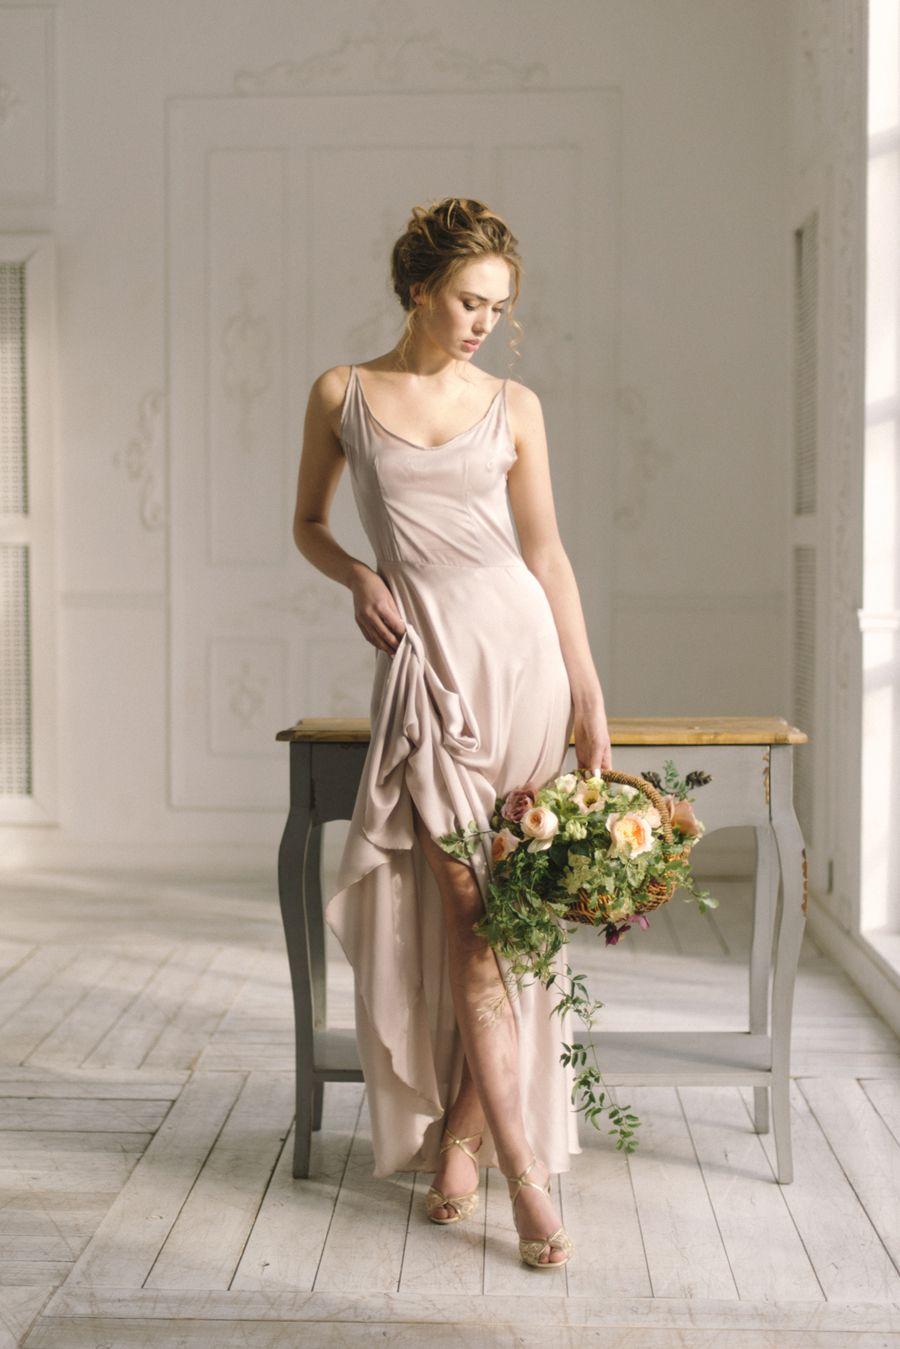 Morning wedding dresses  Blush morning  Wedding Vibes  FINEART WEDDING  Pinterest  Weddings